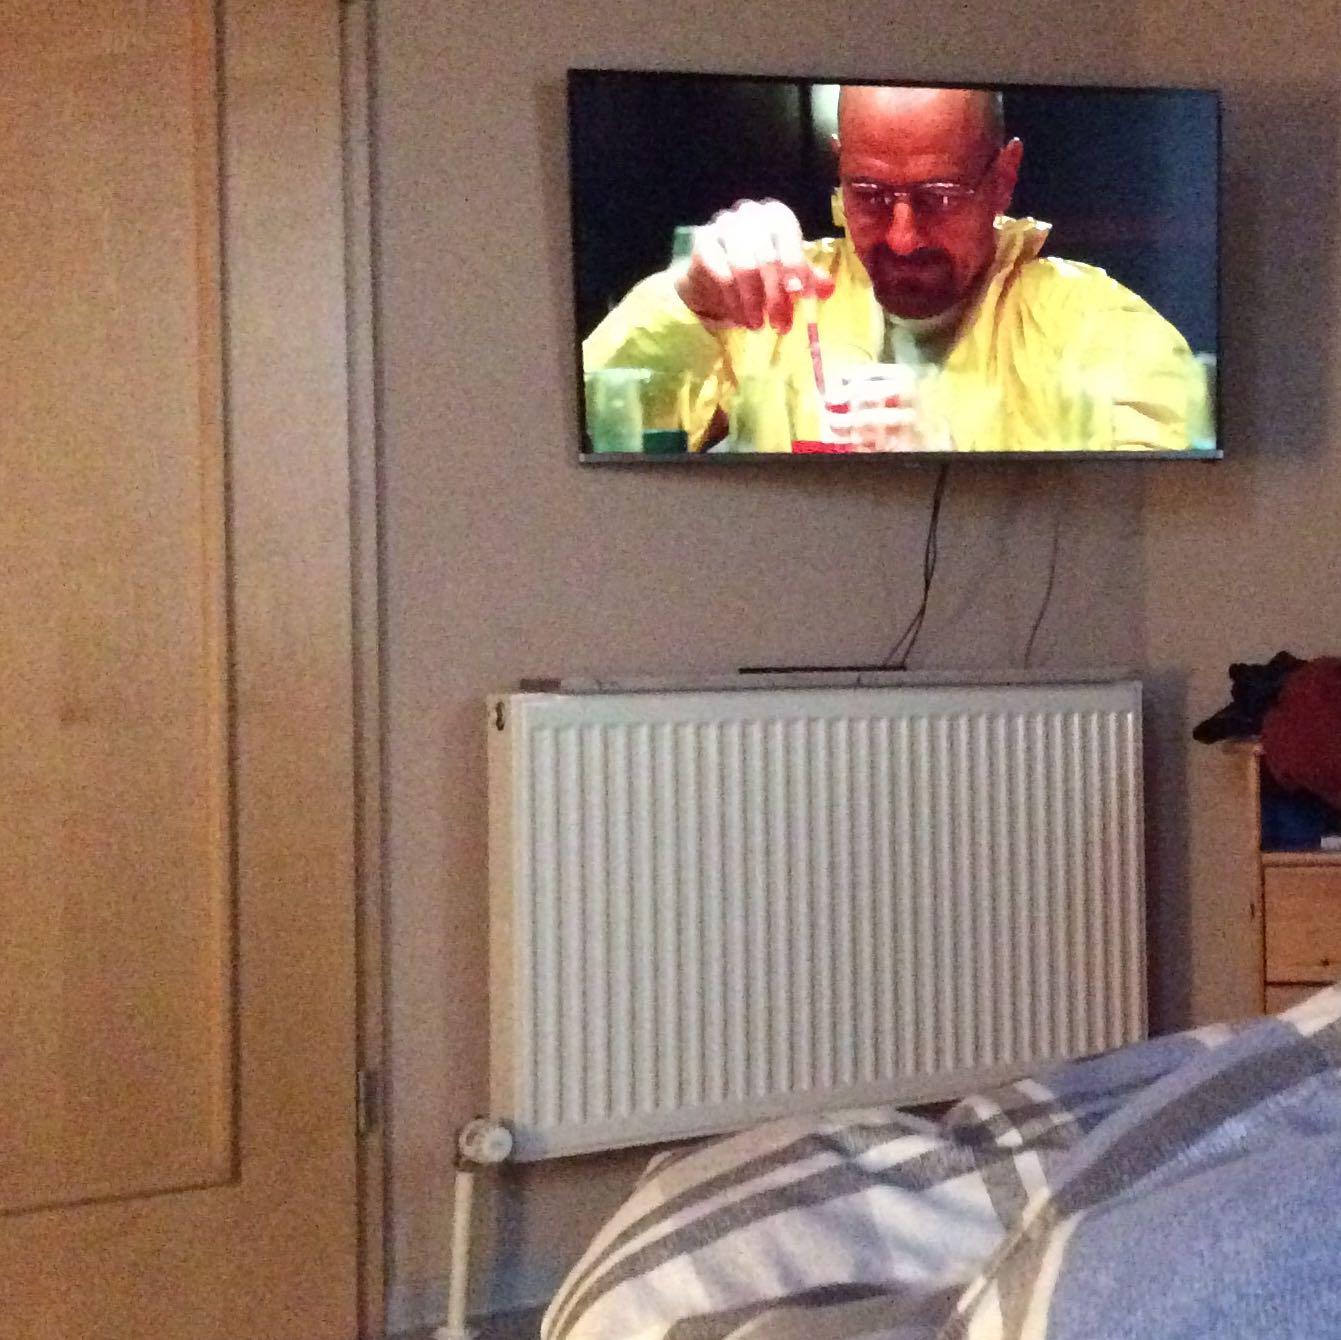 tv ber heizung schule freizeit film. Black Bedroom Furniture Sets. Home Design Ideas